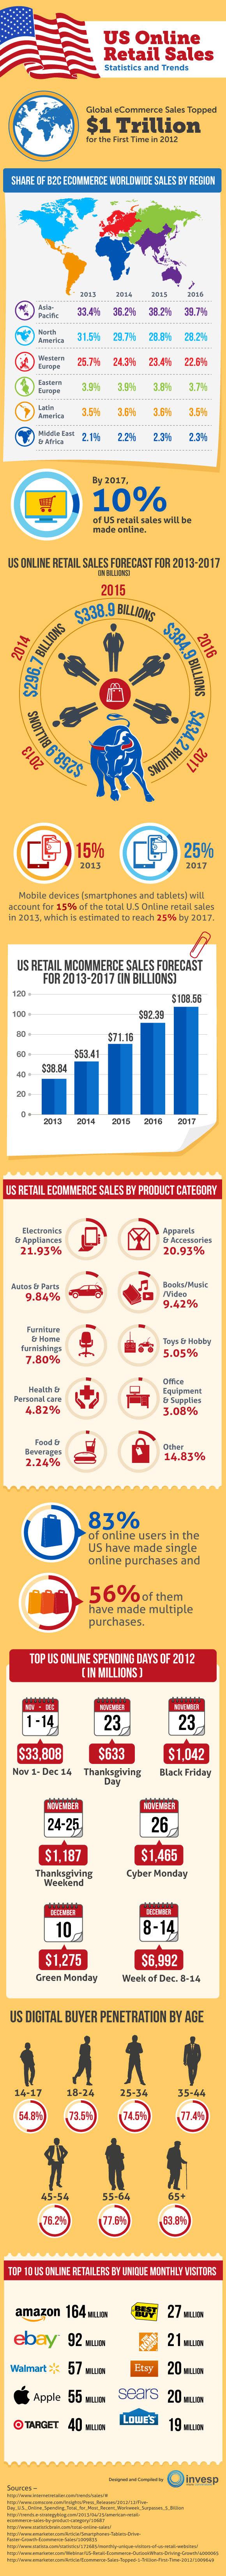 us-online-retail-sales